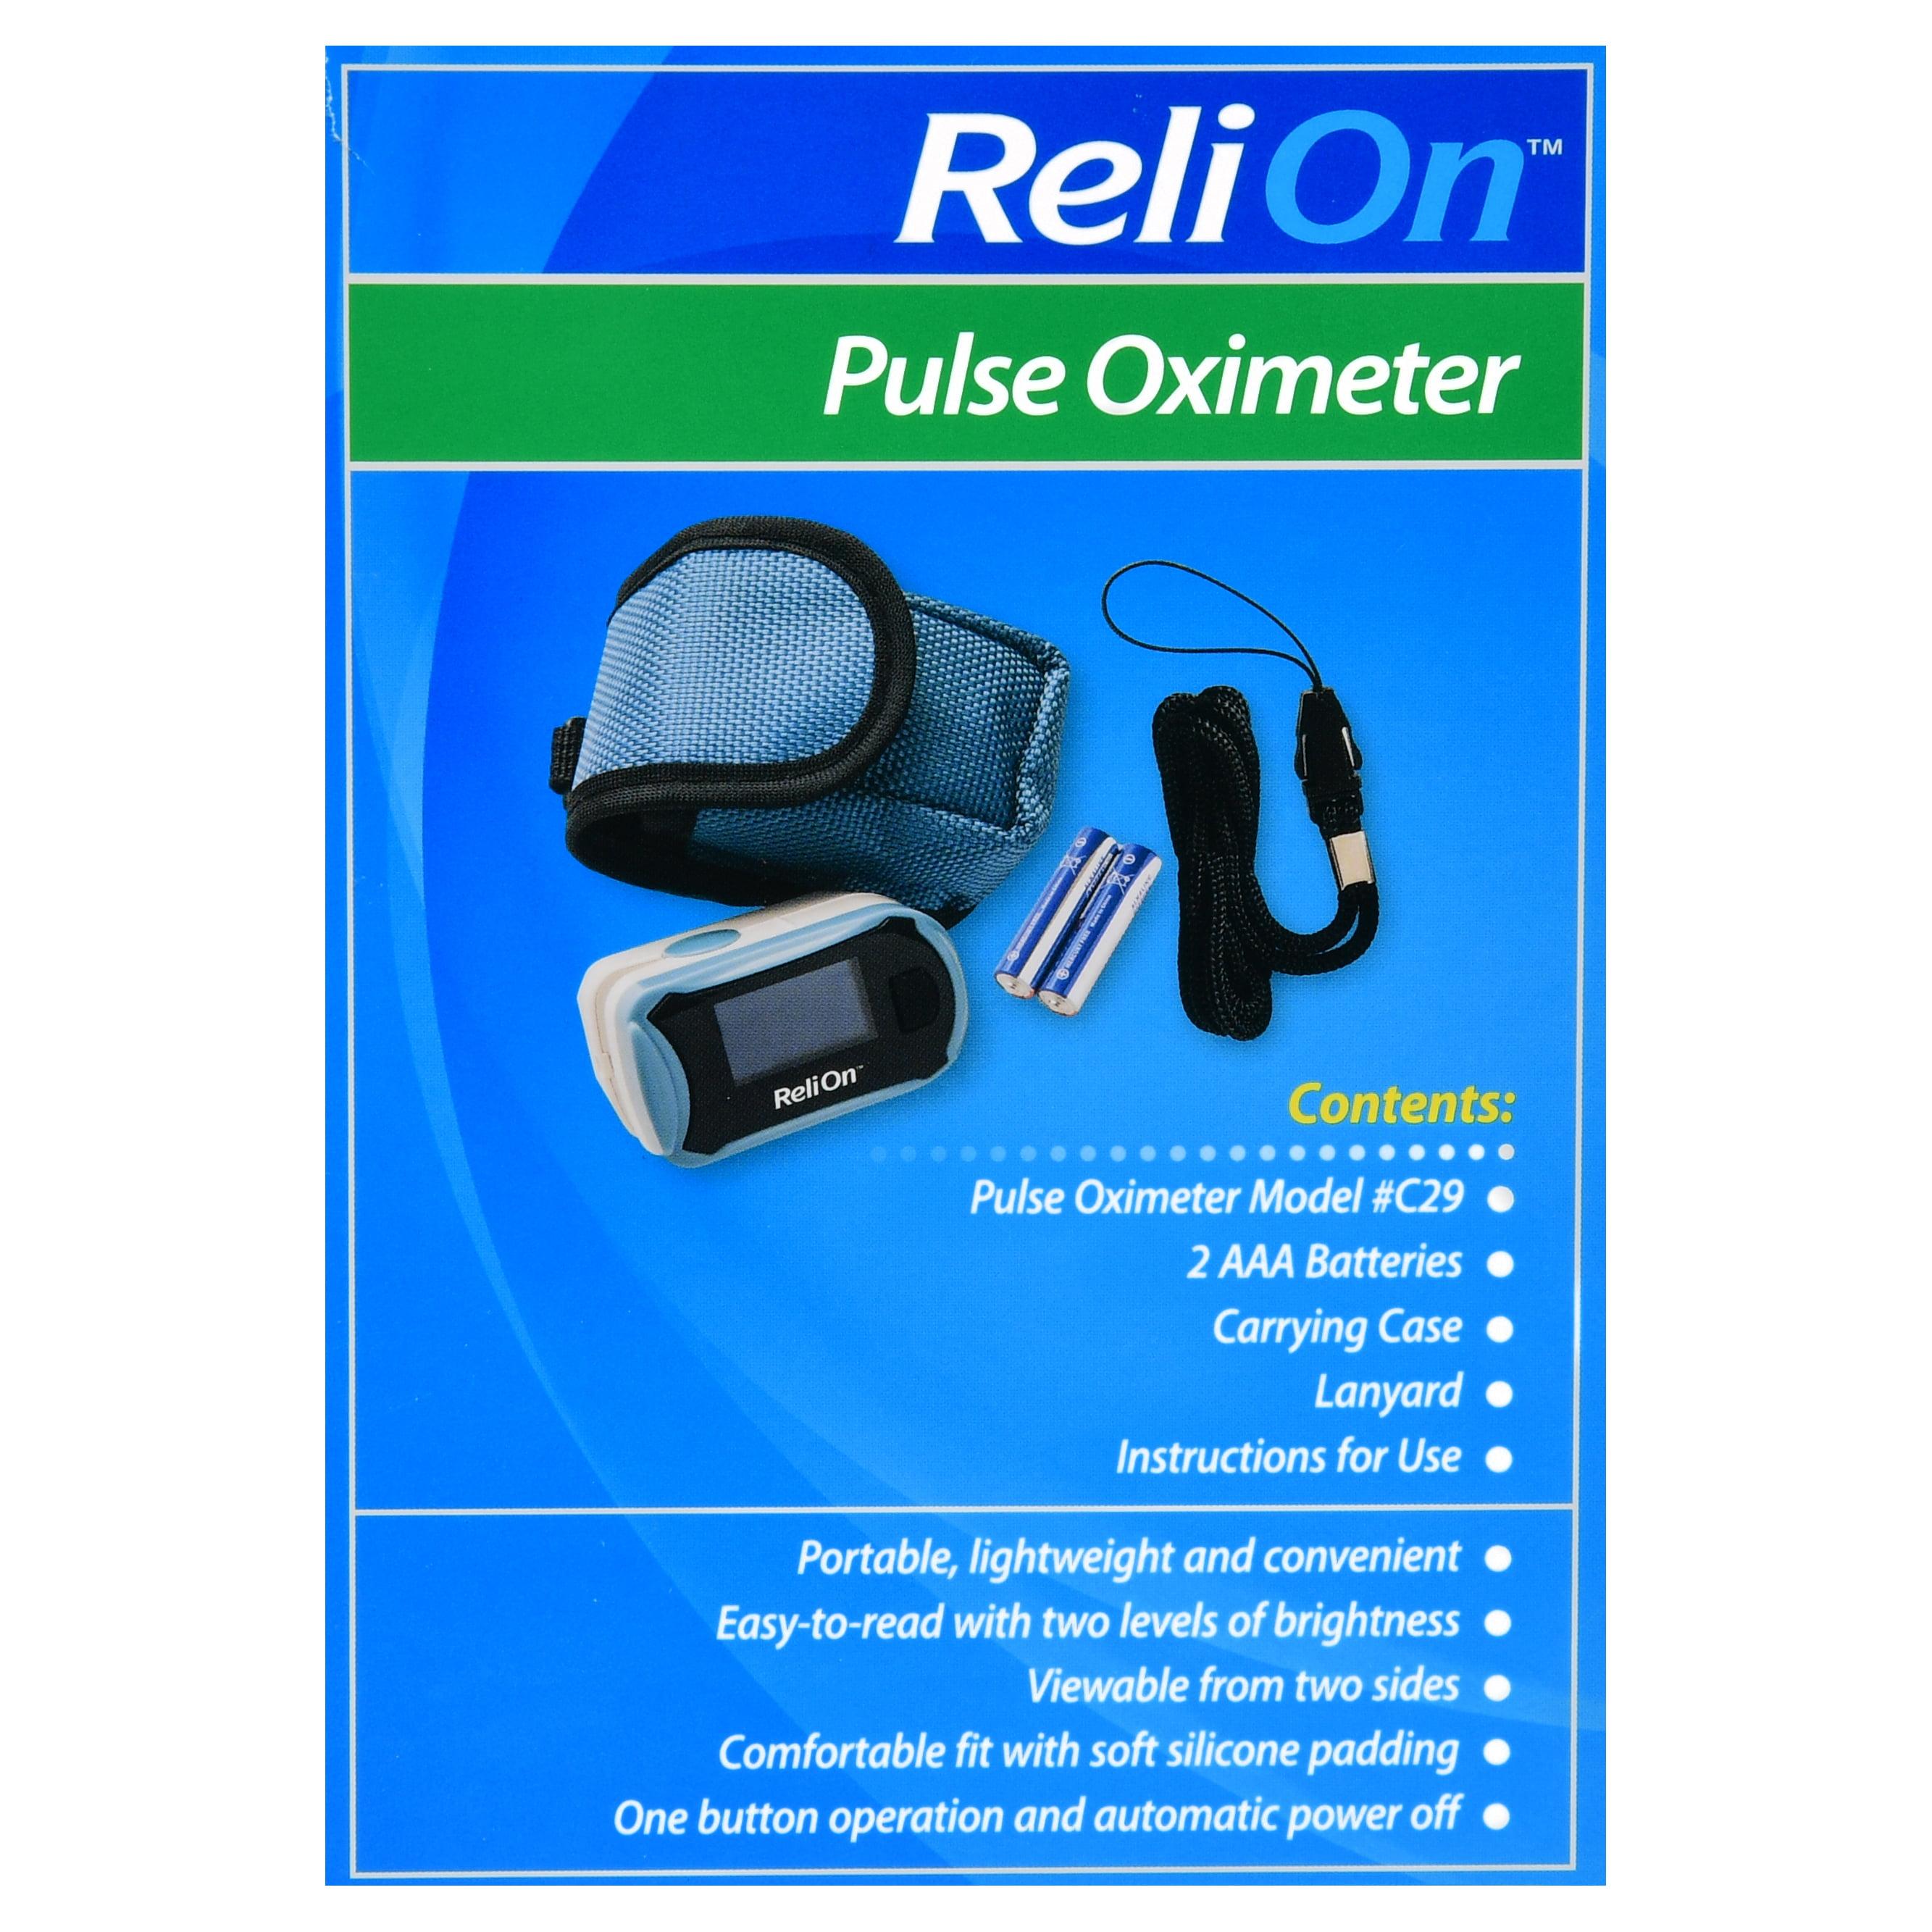 ReliOn Pulse Oximeter - Walmart com